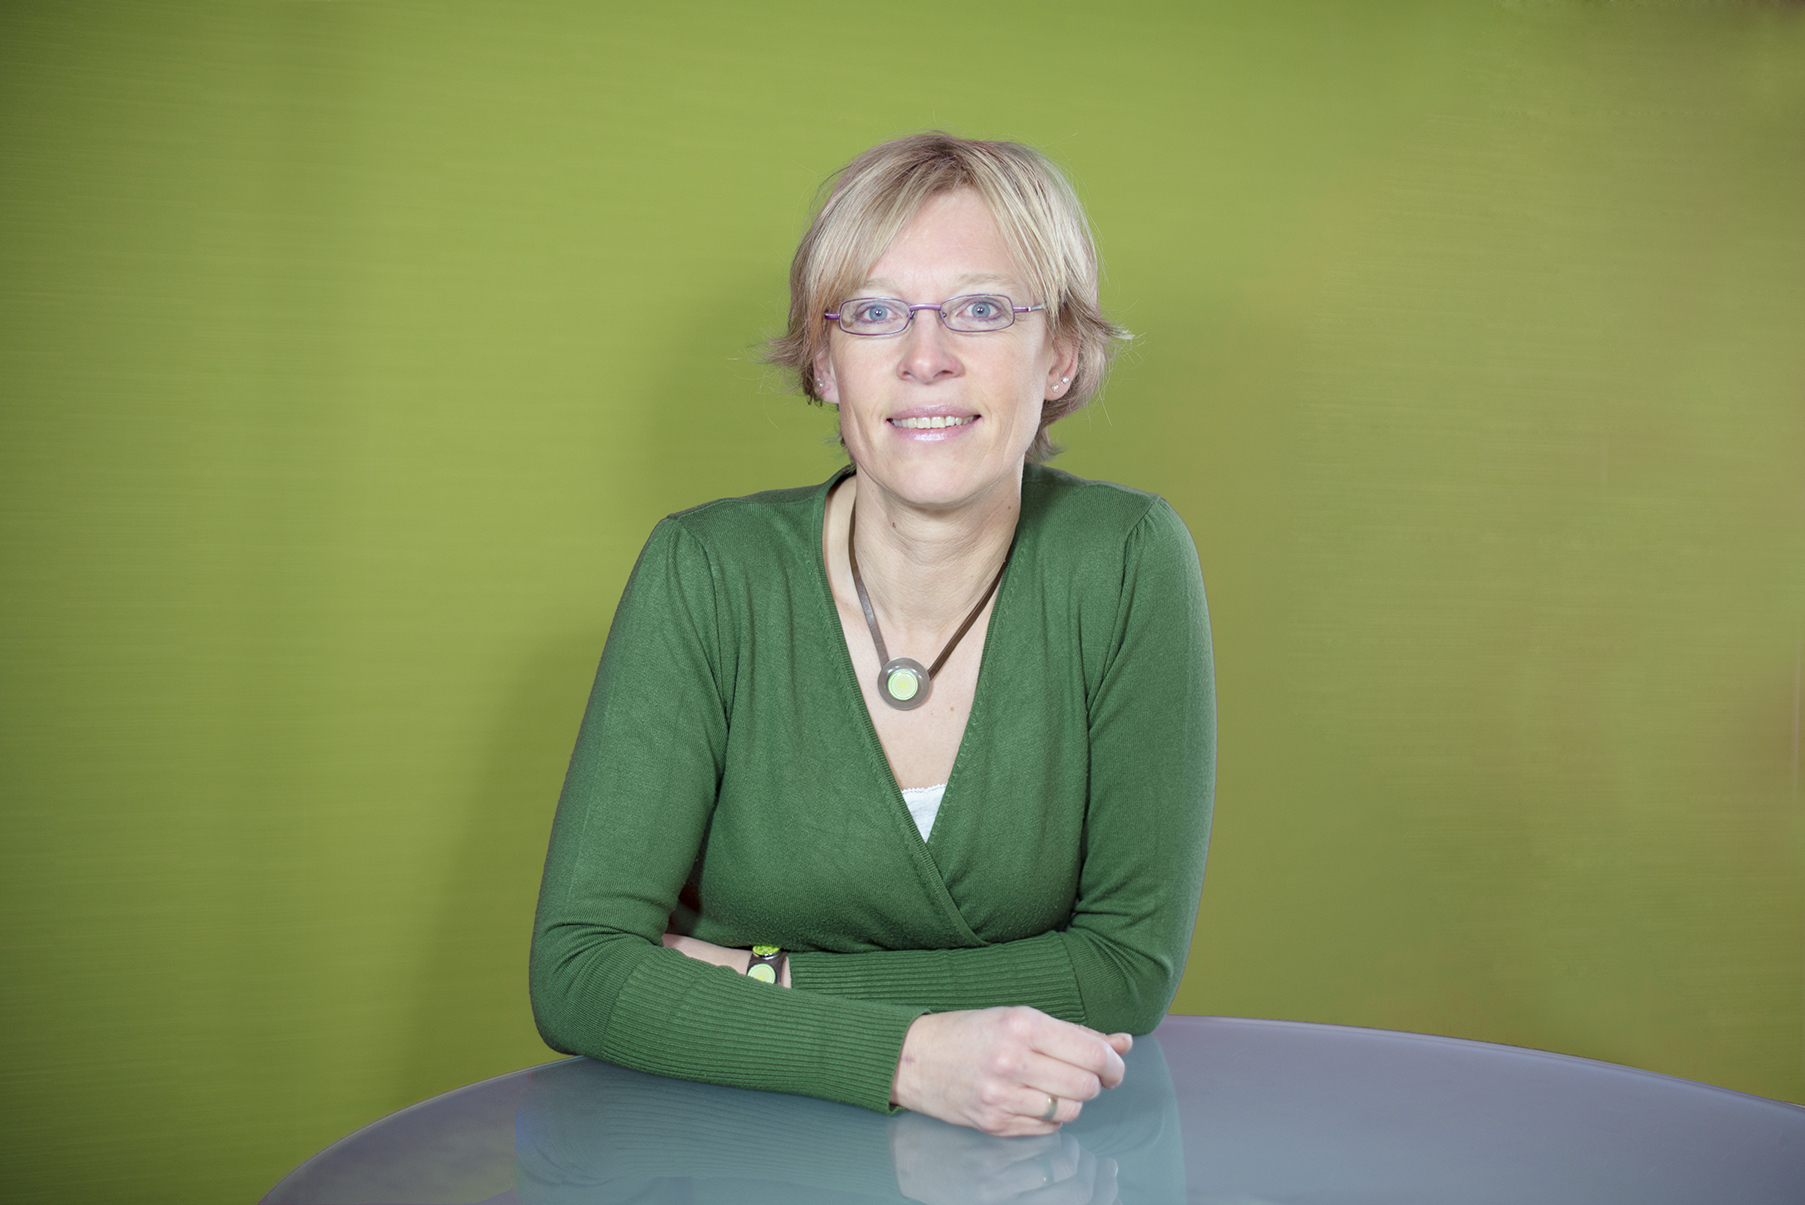 Ulrike_klein